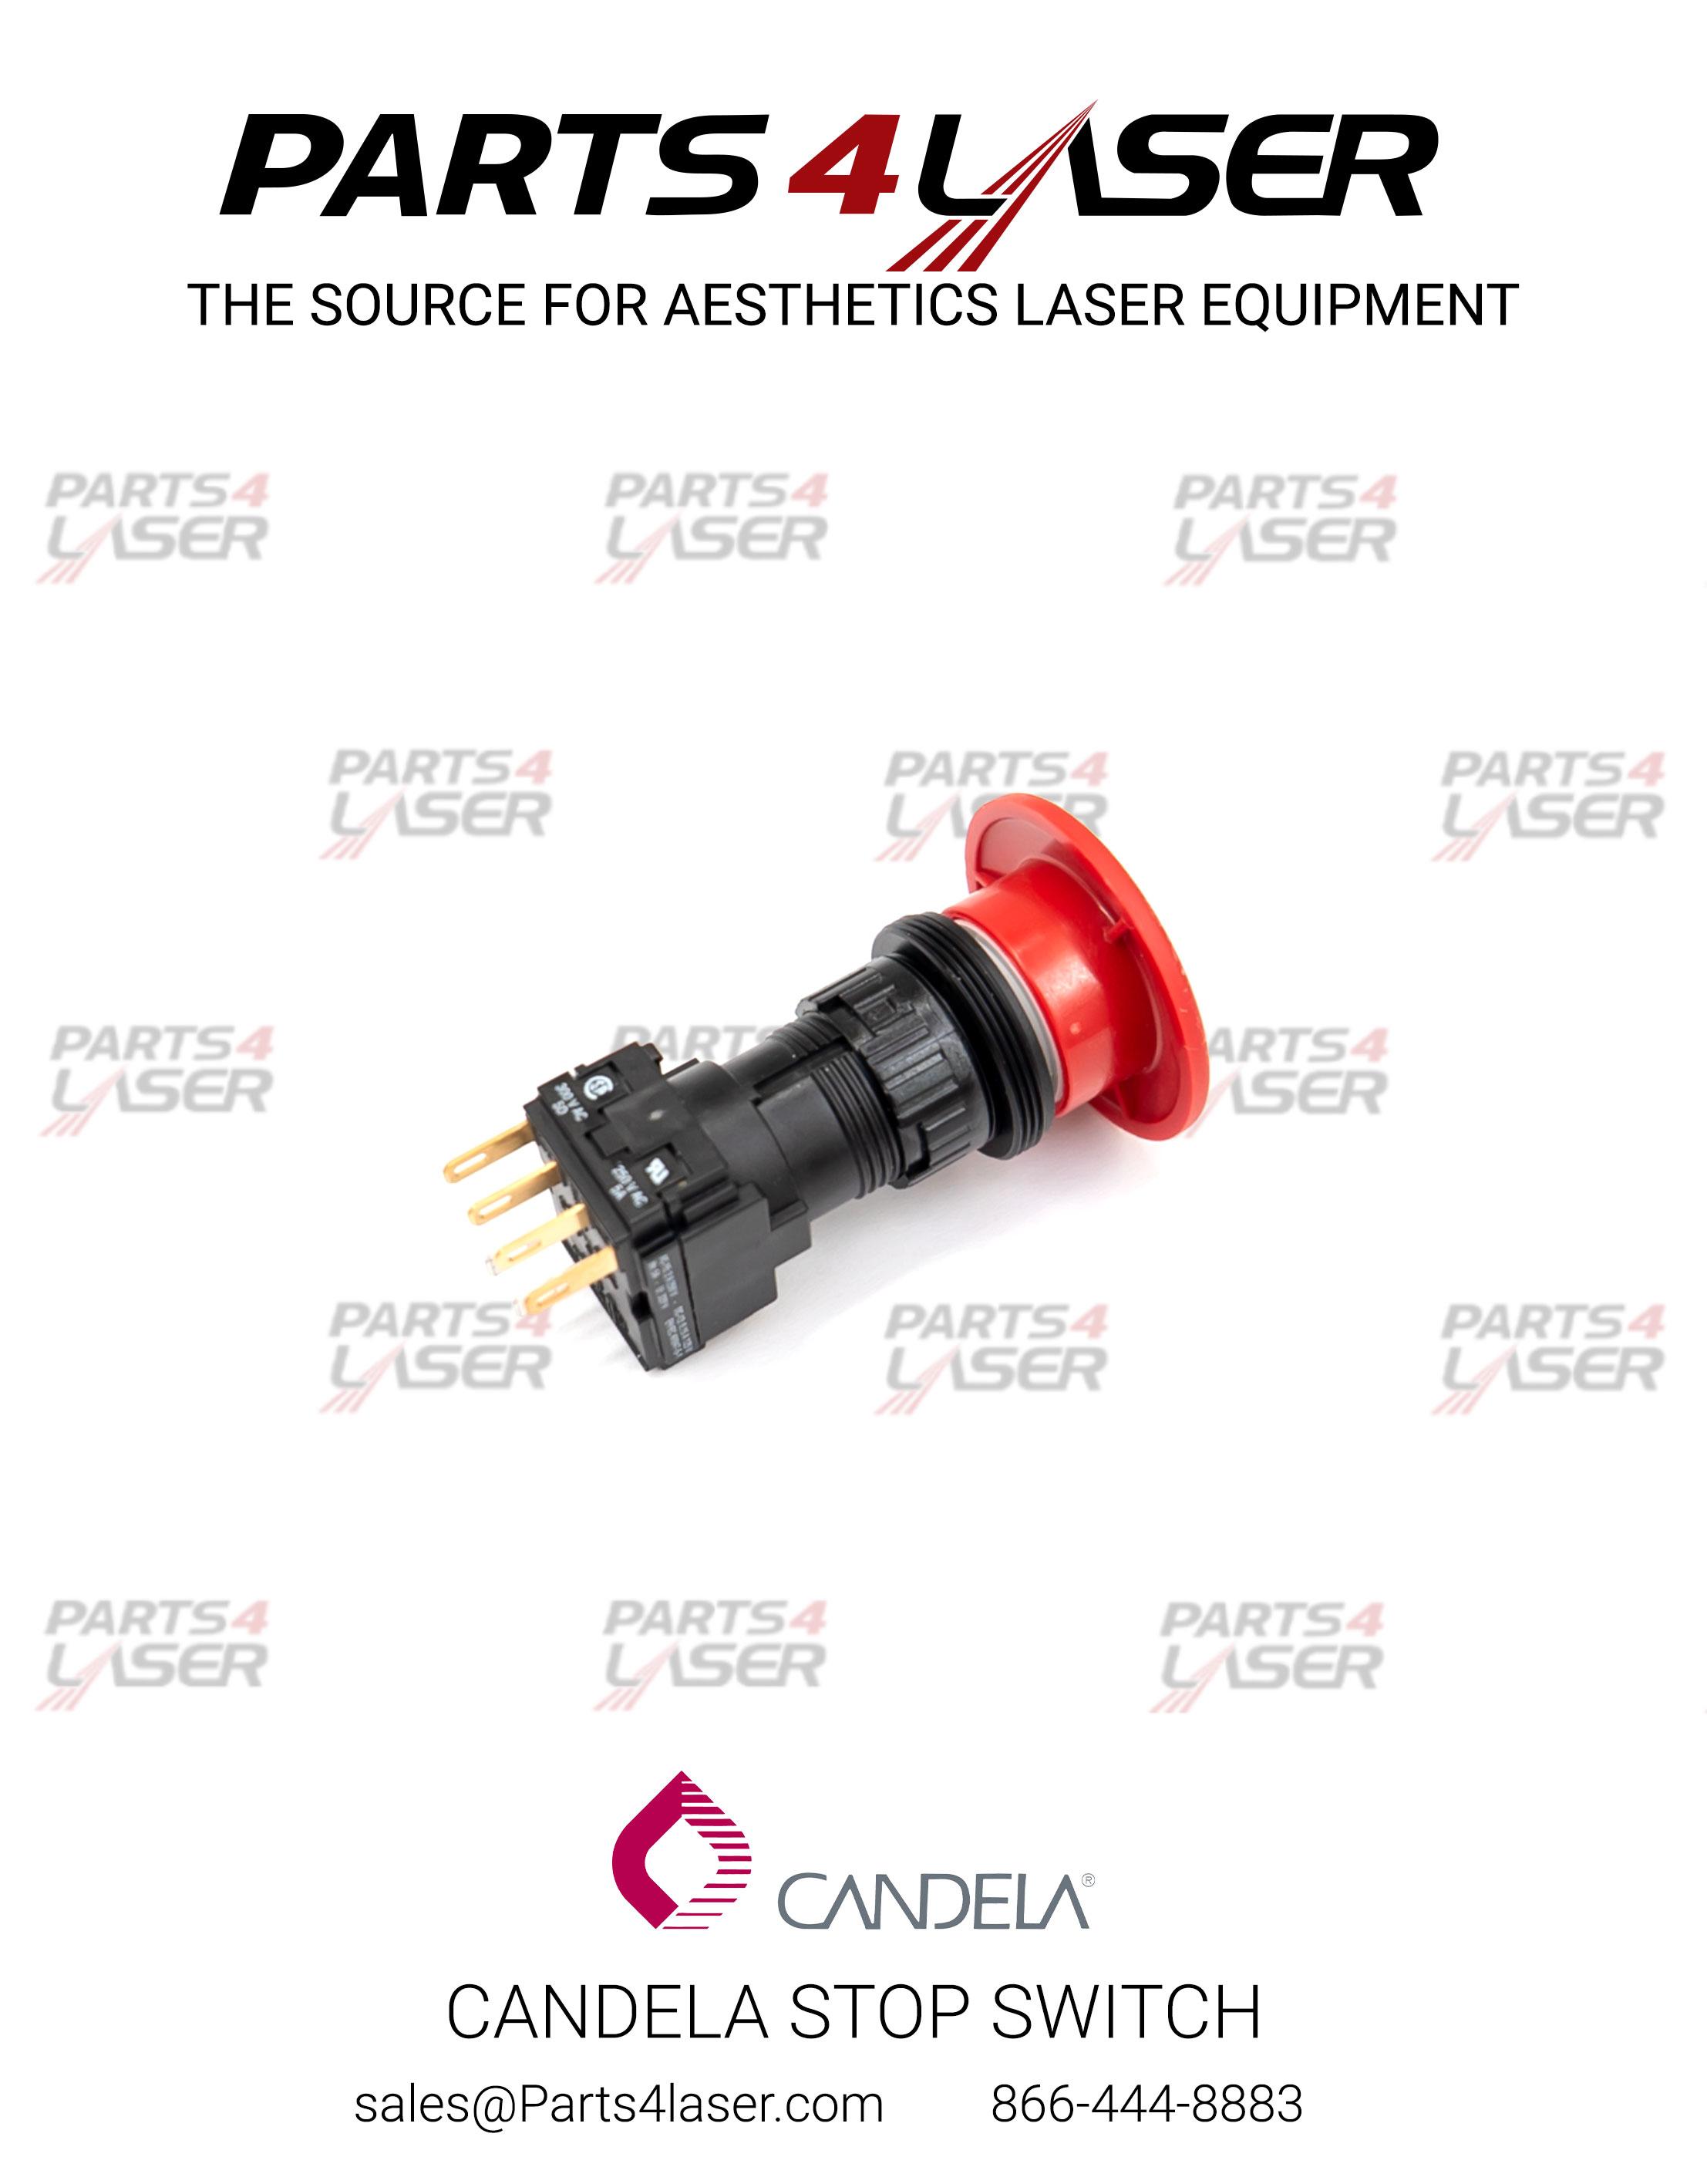 Candela Stop Switch Parts4laser